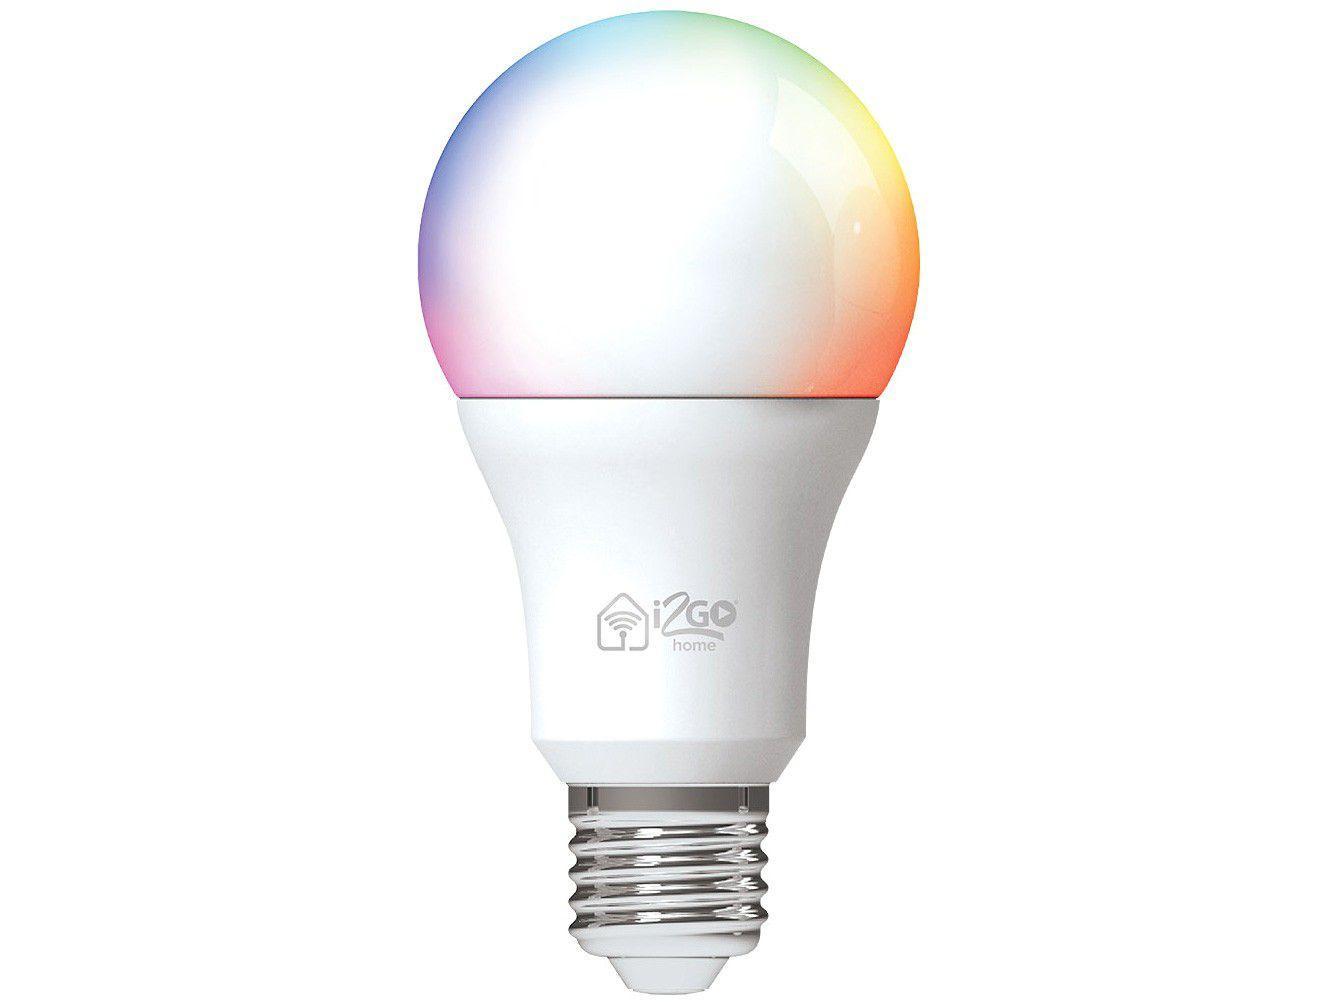 Lâmpada Inteligente I2GO E27 RGB - Dimerizável 10W Smart Lamp Wi-Fi